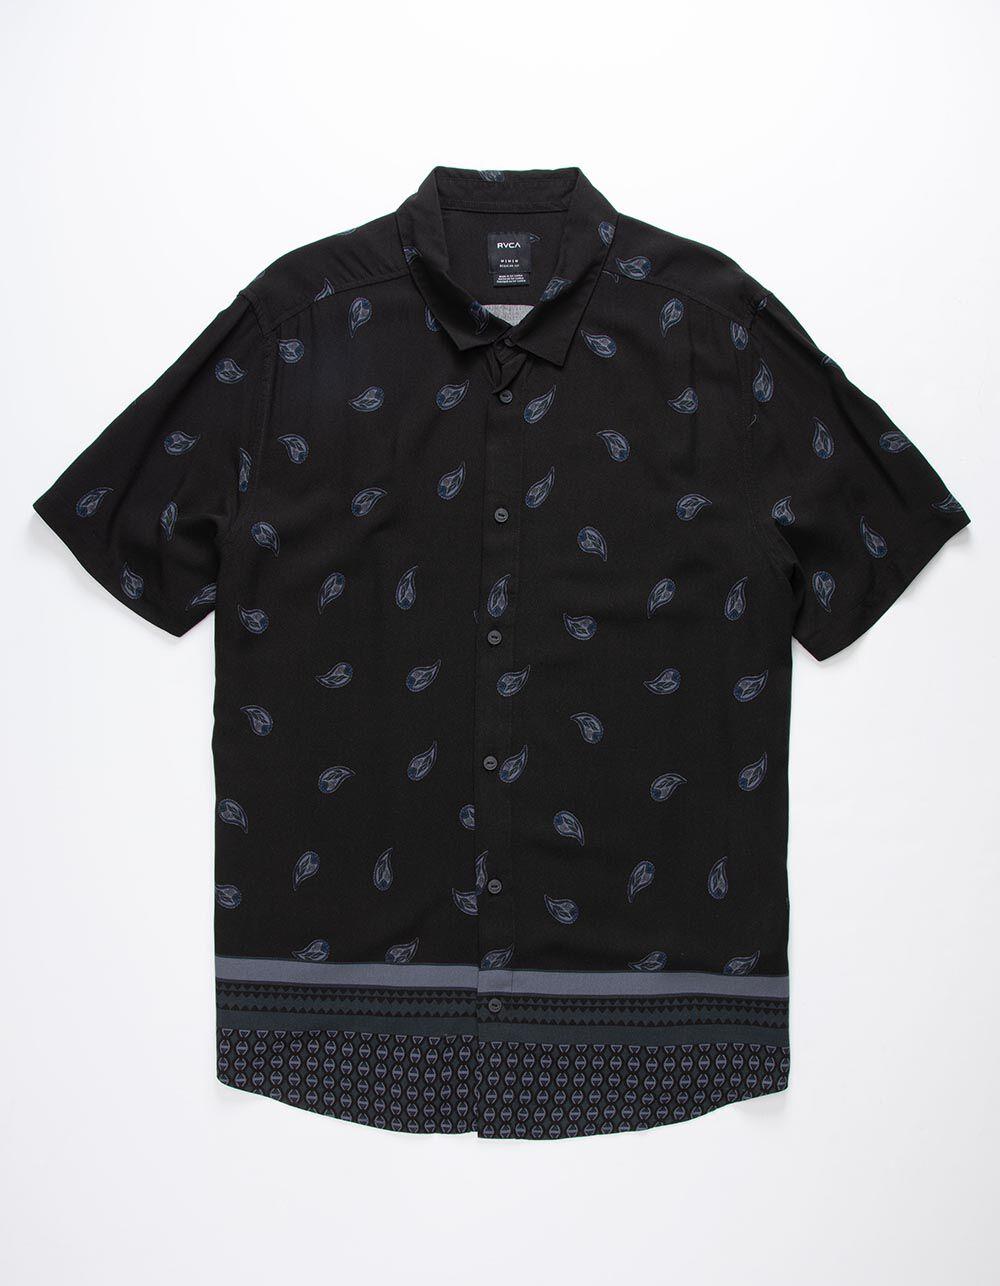 RVCA Lux Paisley Black Shirt